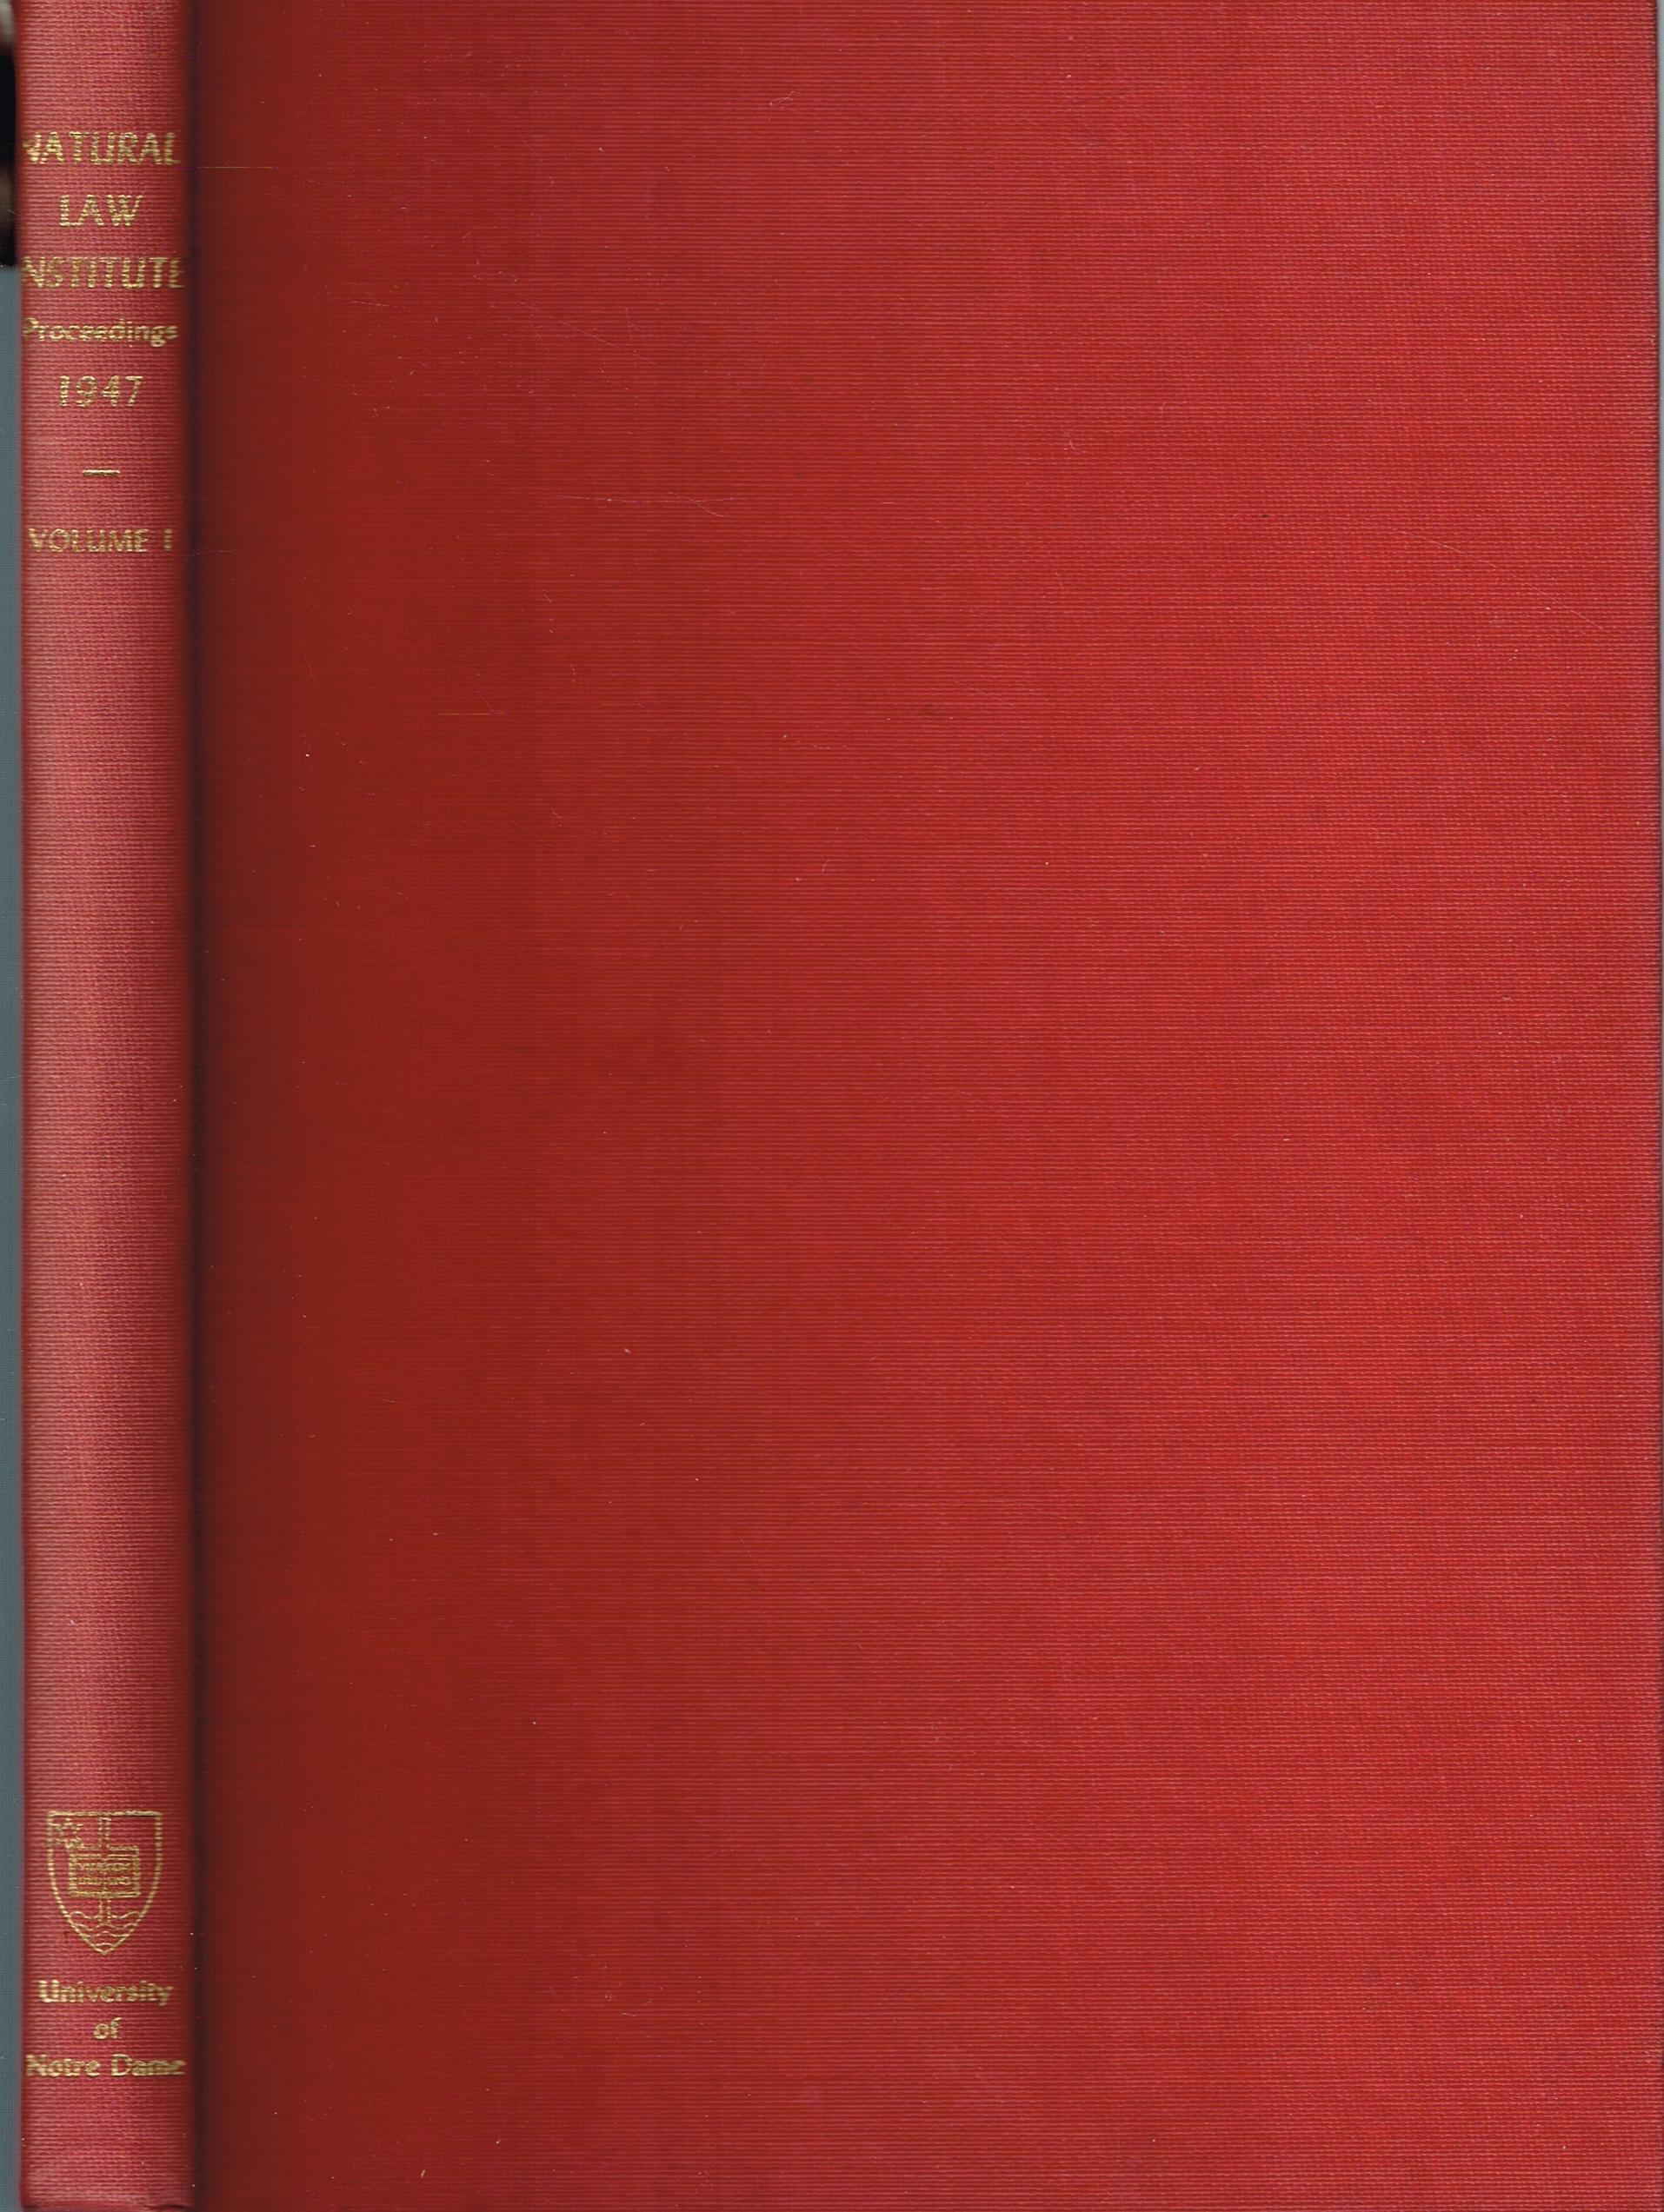 UNIVERSITY OF NOTRE DAME NATURAL LAW INSTITUTE PROCEEDINGS VOLUME I 1947:  Amazon.com: Books